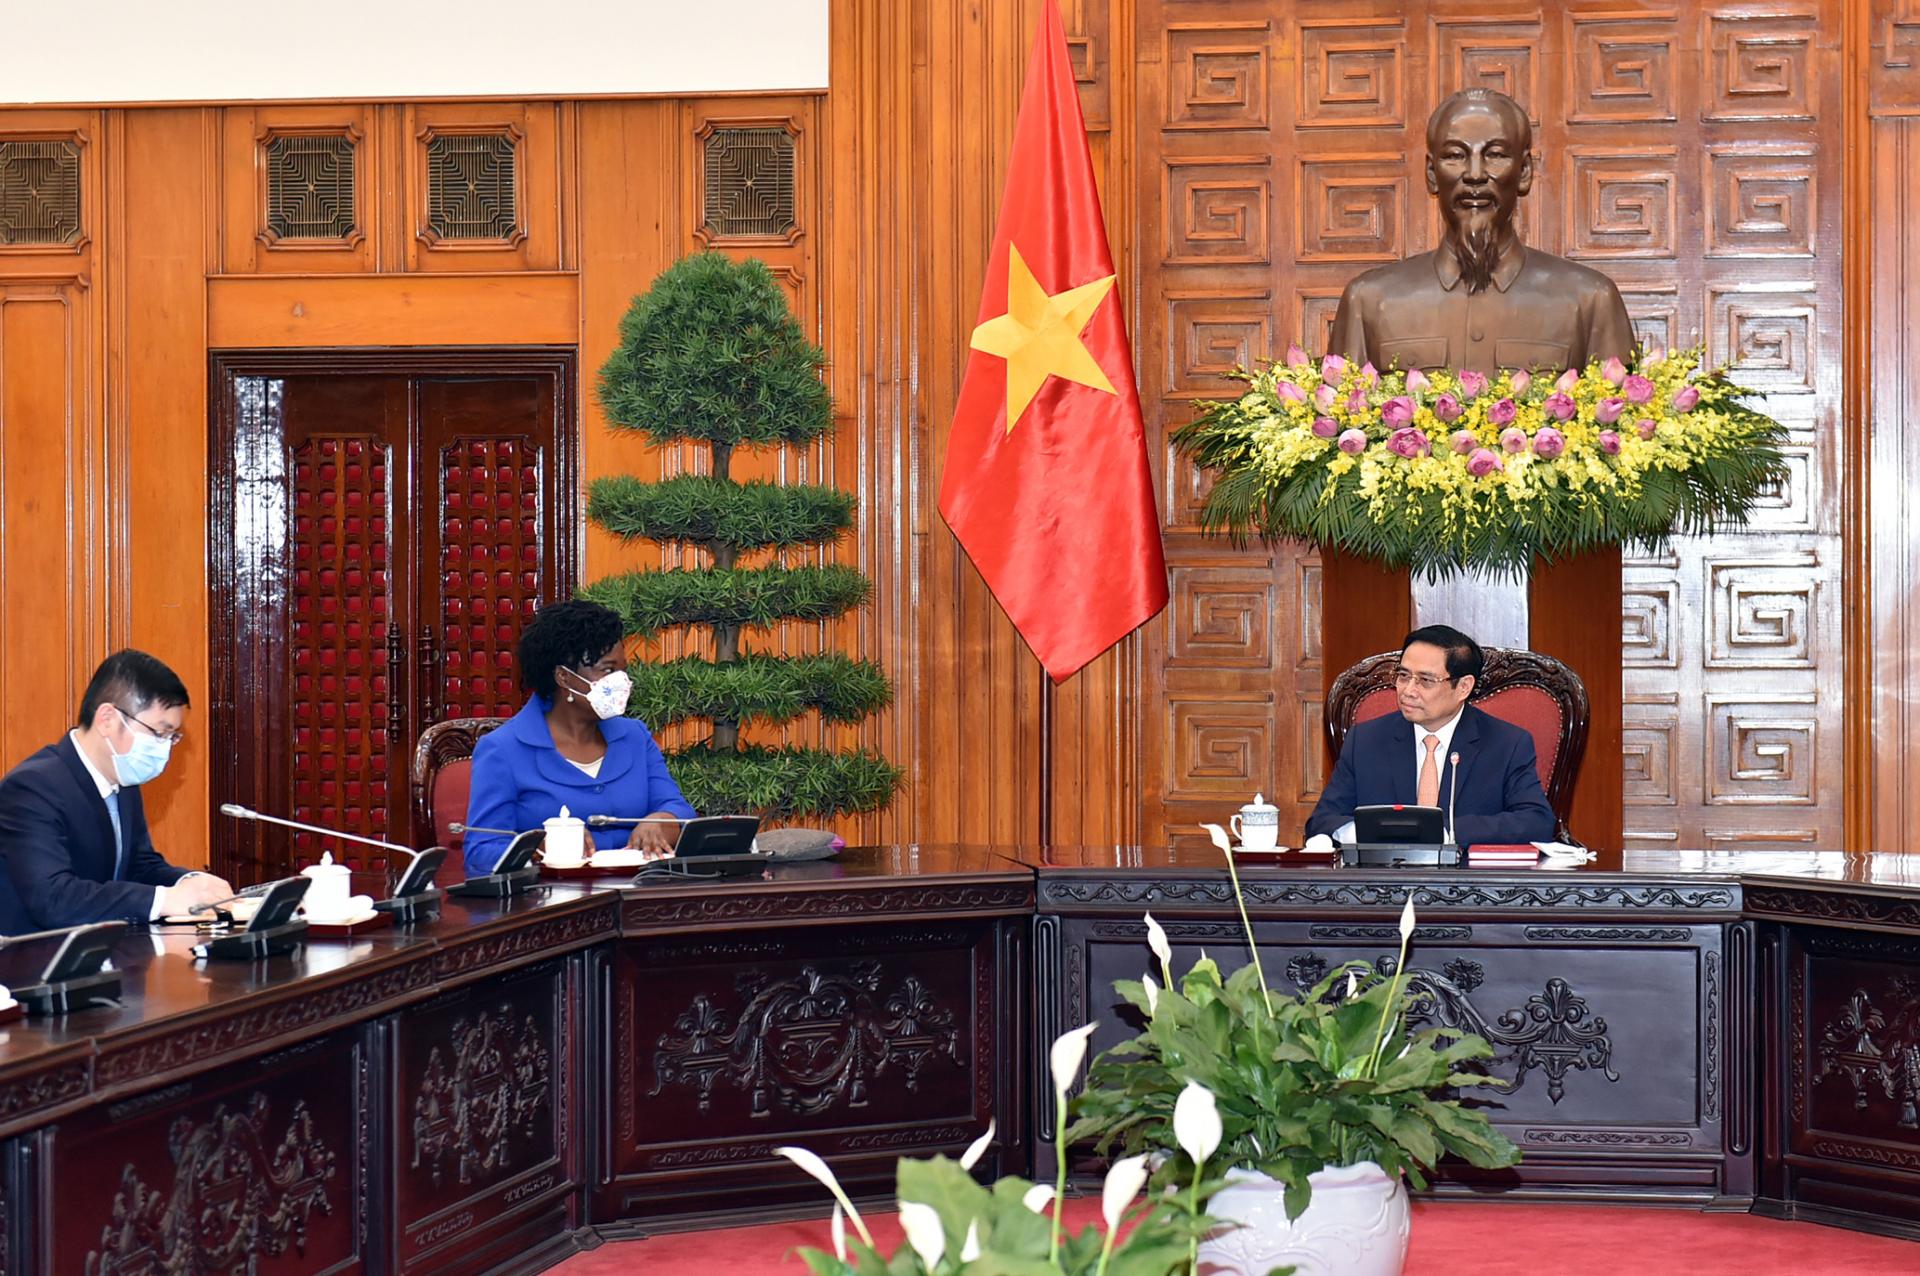 WB expresses agreement in supporting Vietnam's socio-economic development